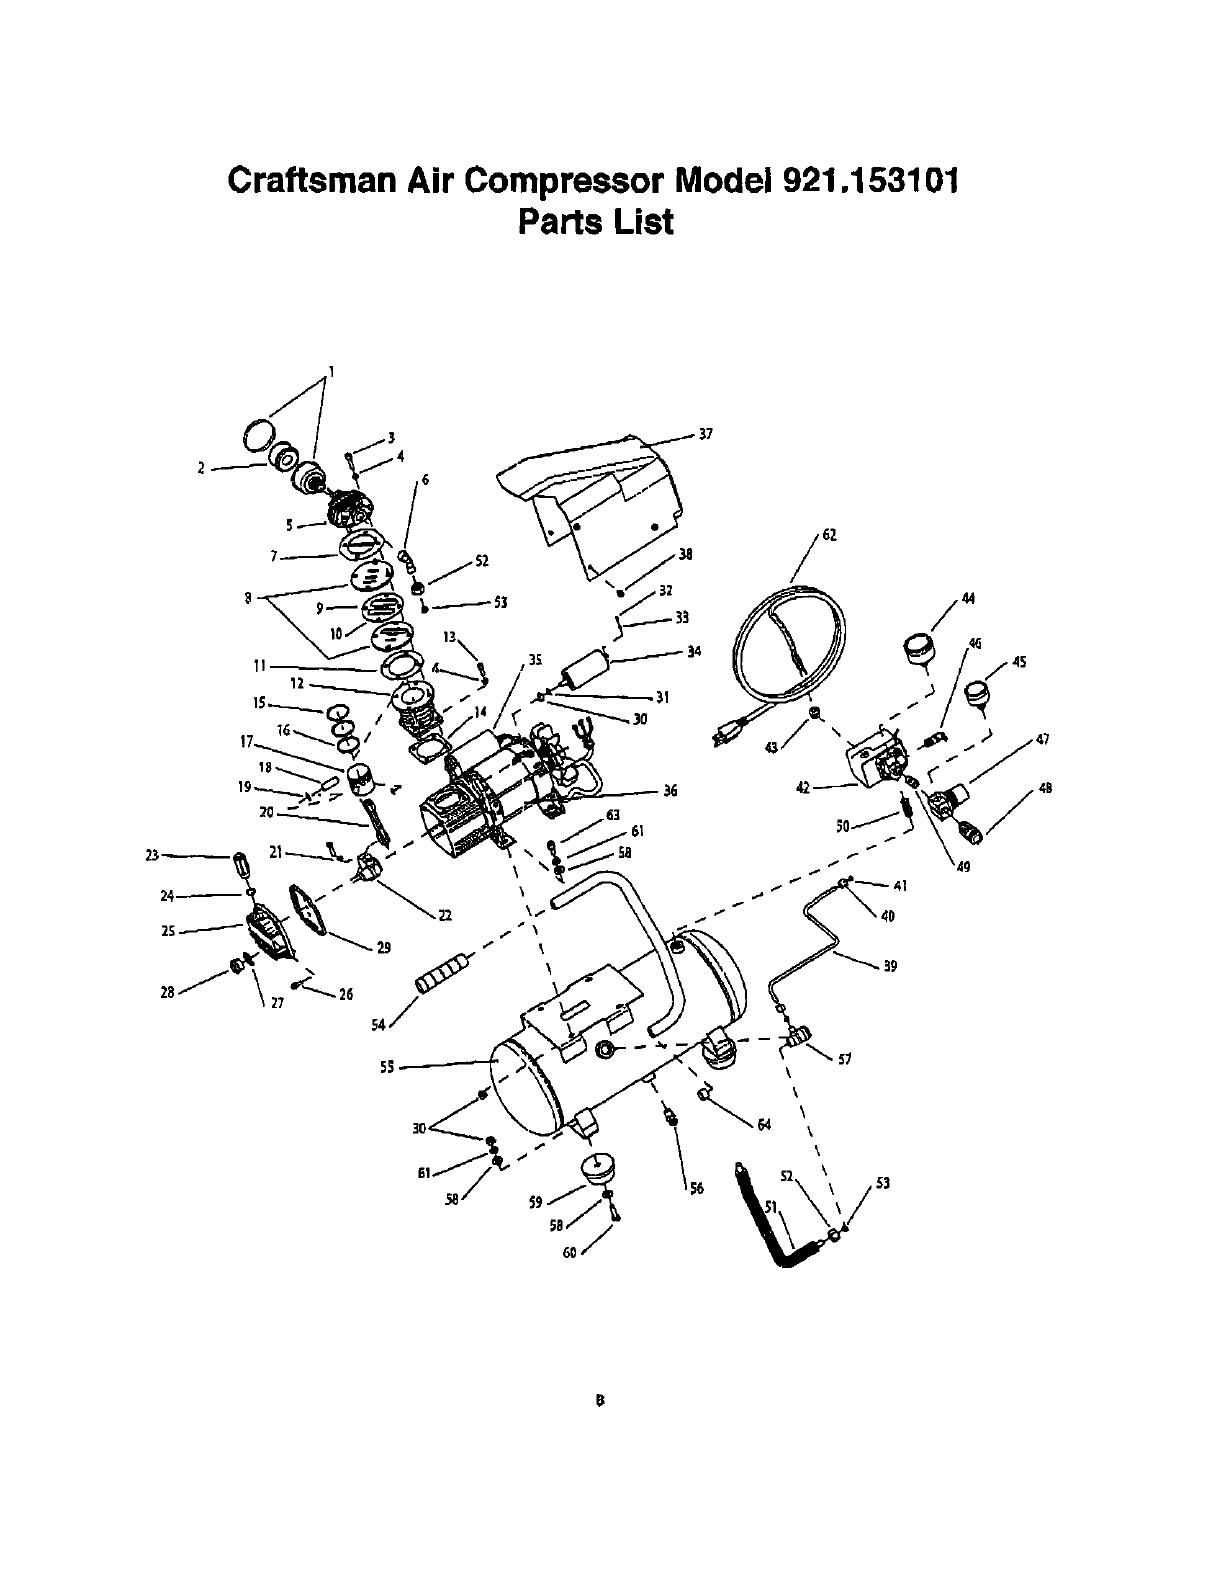 Craftsman 921153101 User Manual AIR COMPRESSOR Manuals And